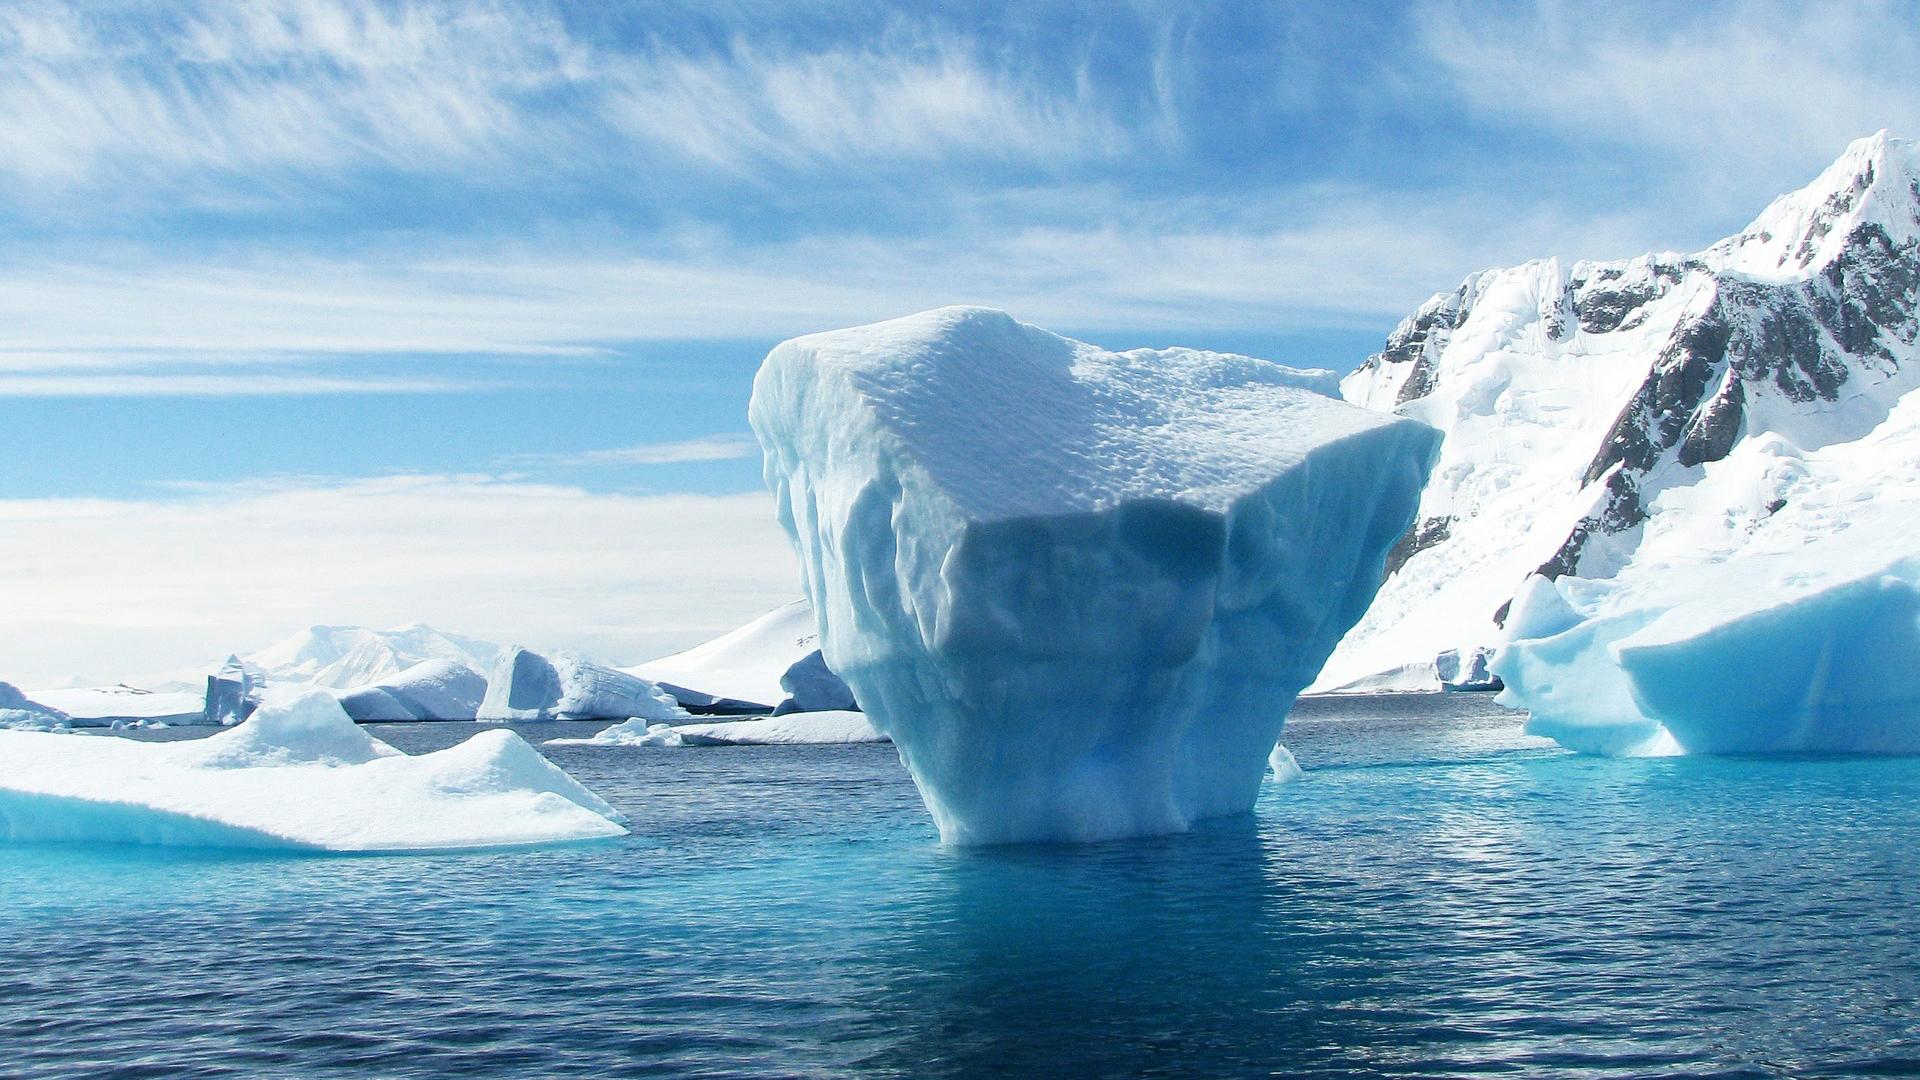 Icebergs float in artic blue water